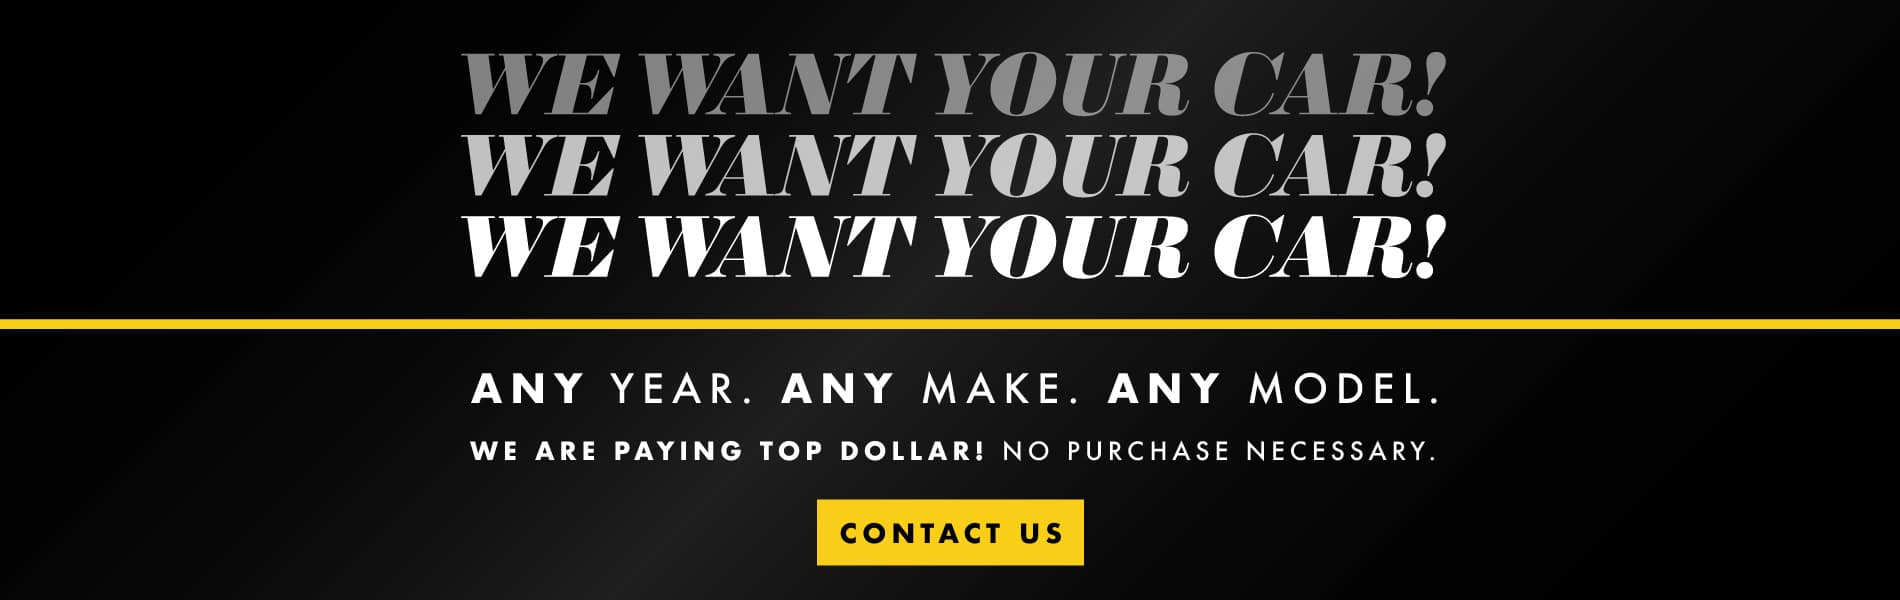 16513-kenaut-Aug20-We-Want-Your-Car-Digital-Graphics-1900X600